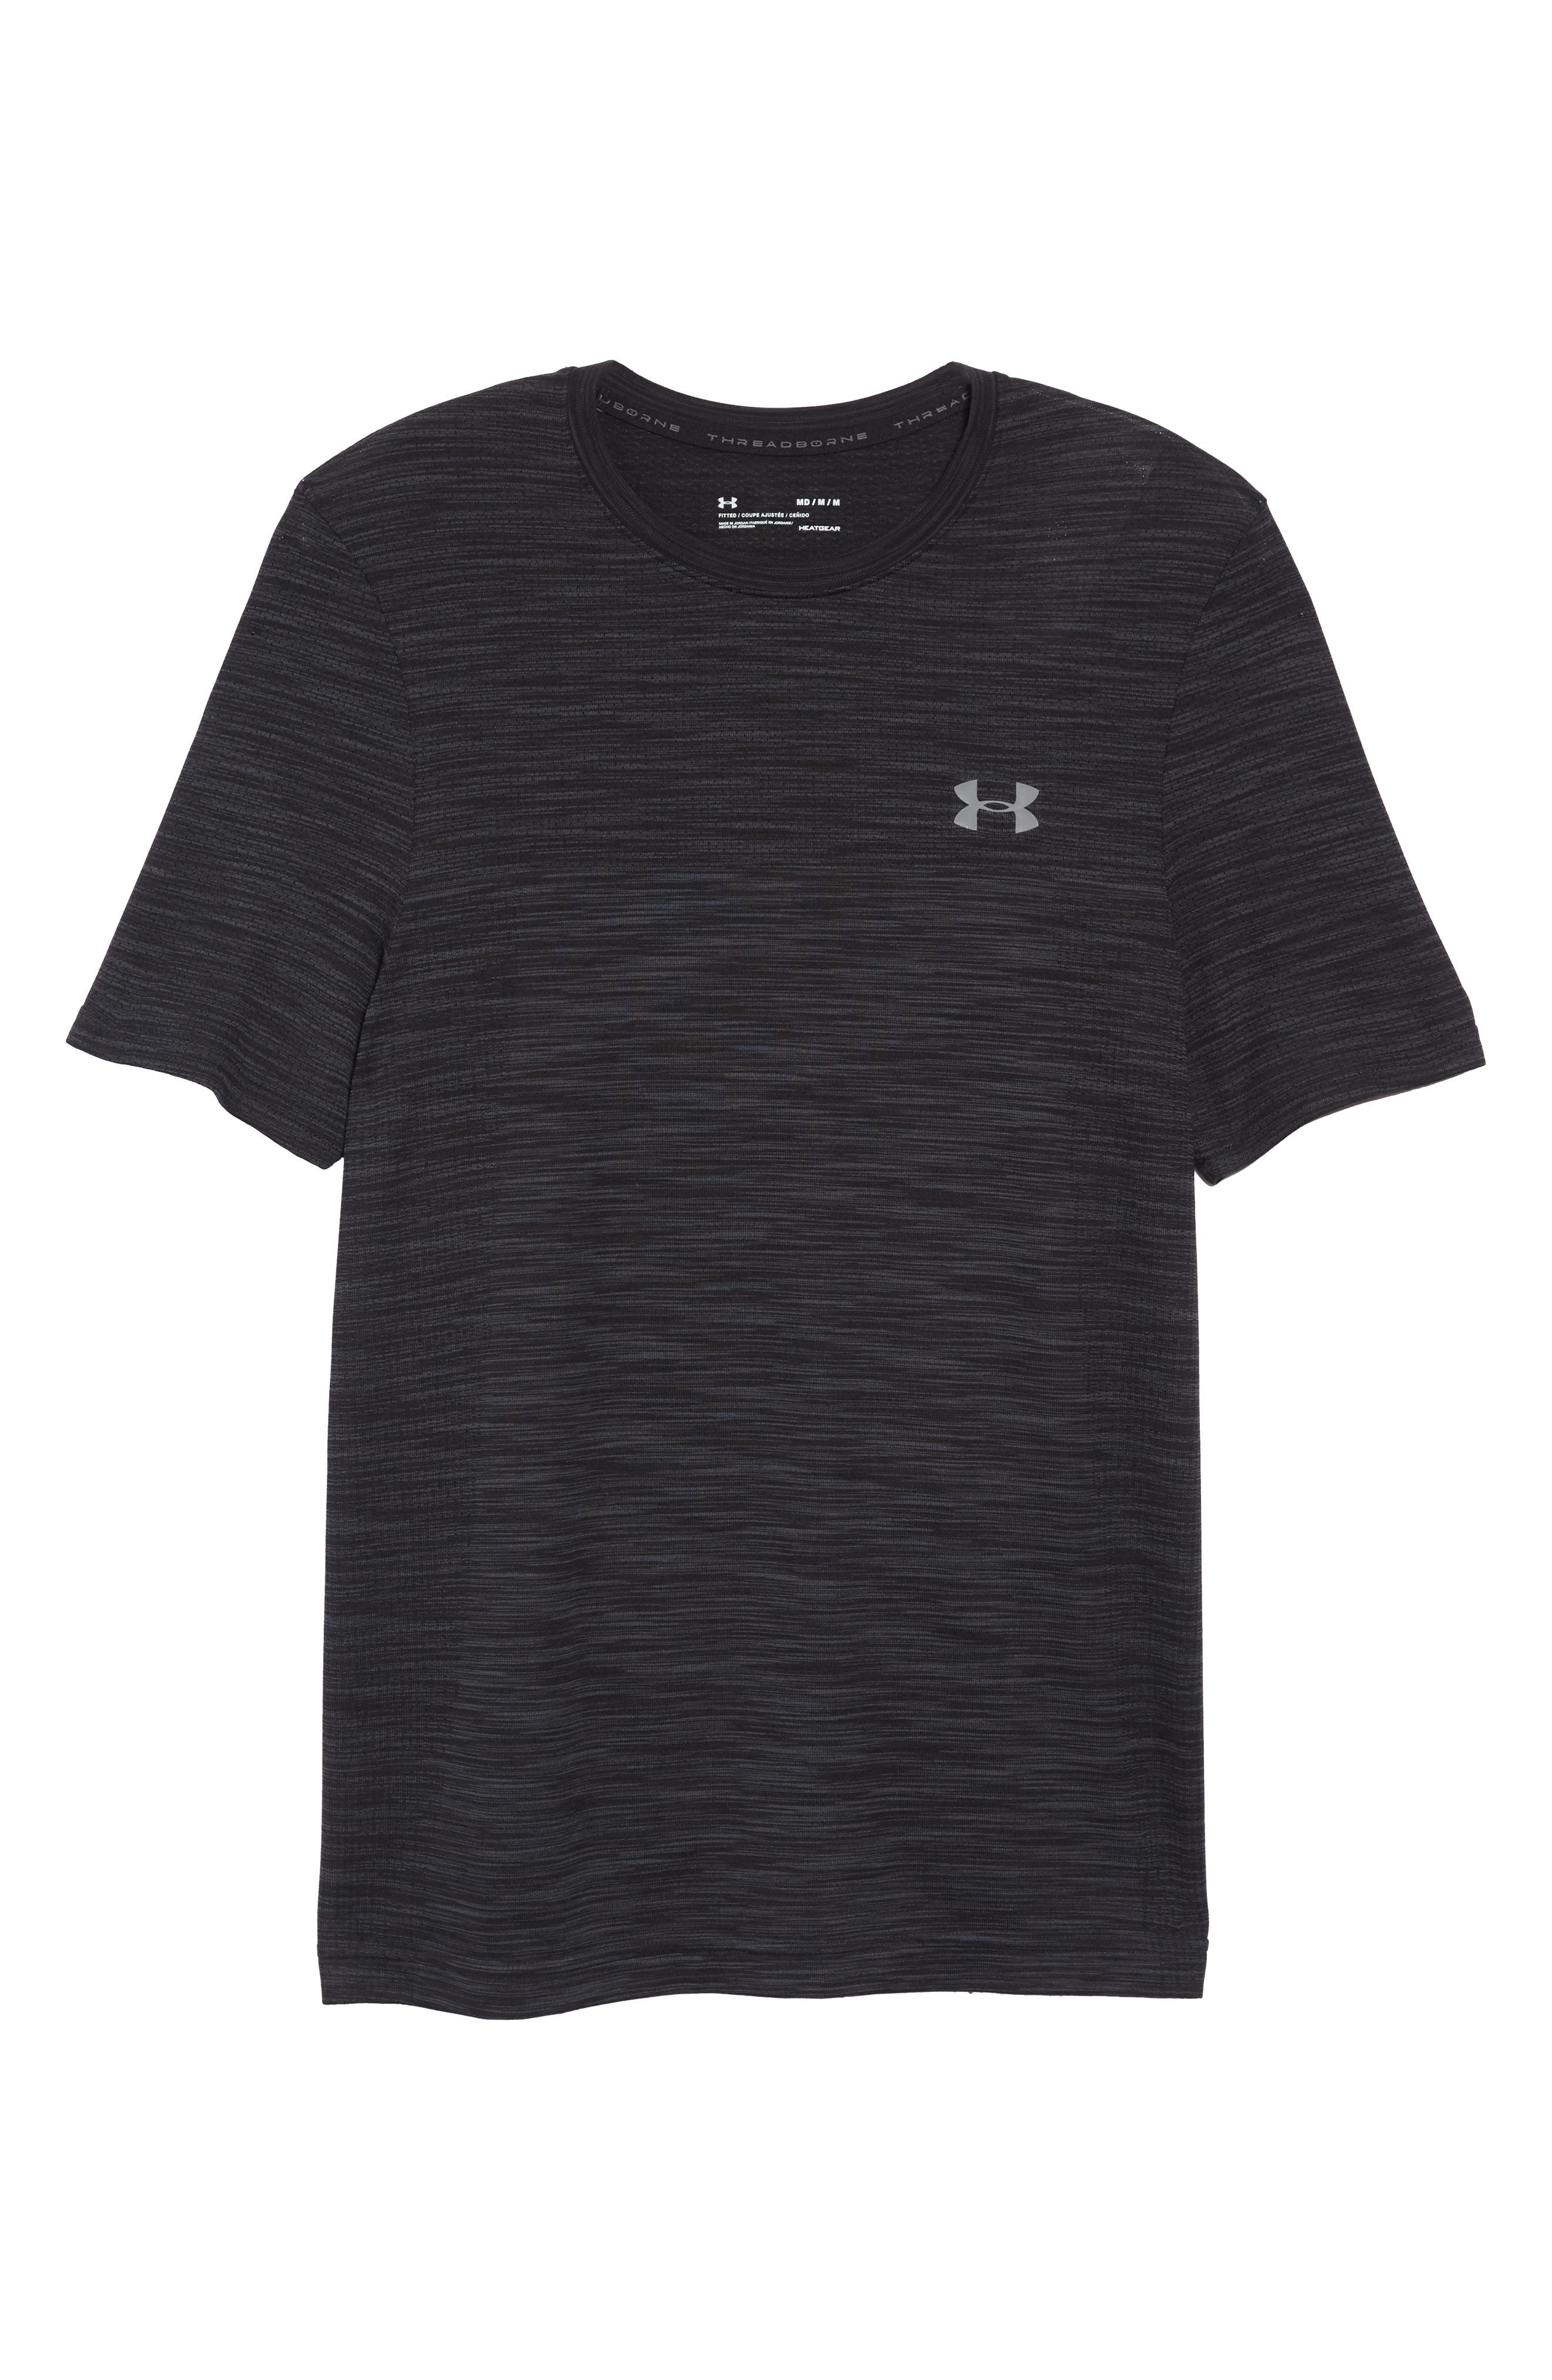 Siphon Performance T-Shirt,                             Alternate thumbnail 6, color,                             BLACK